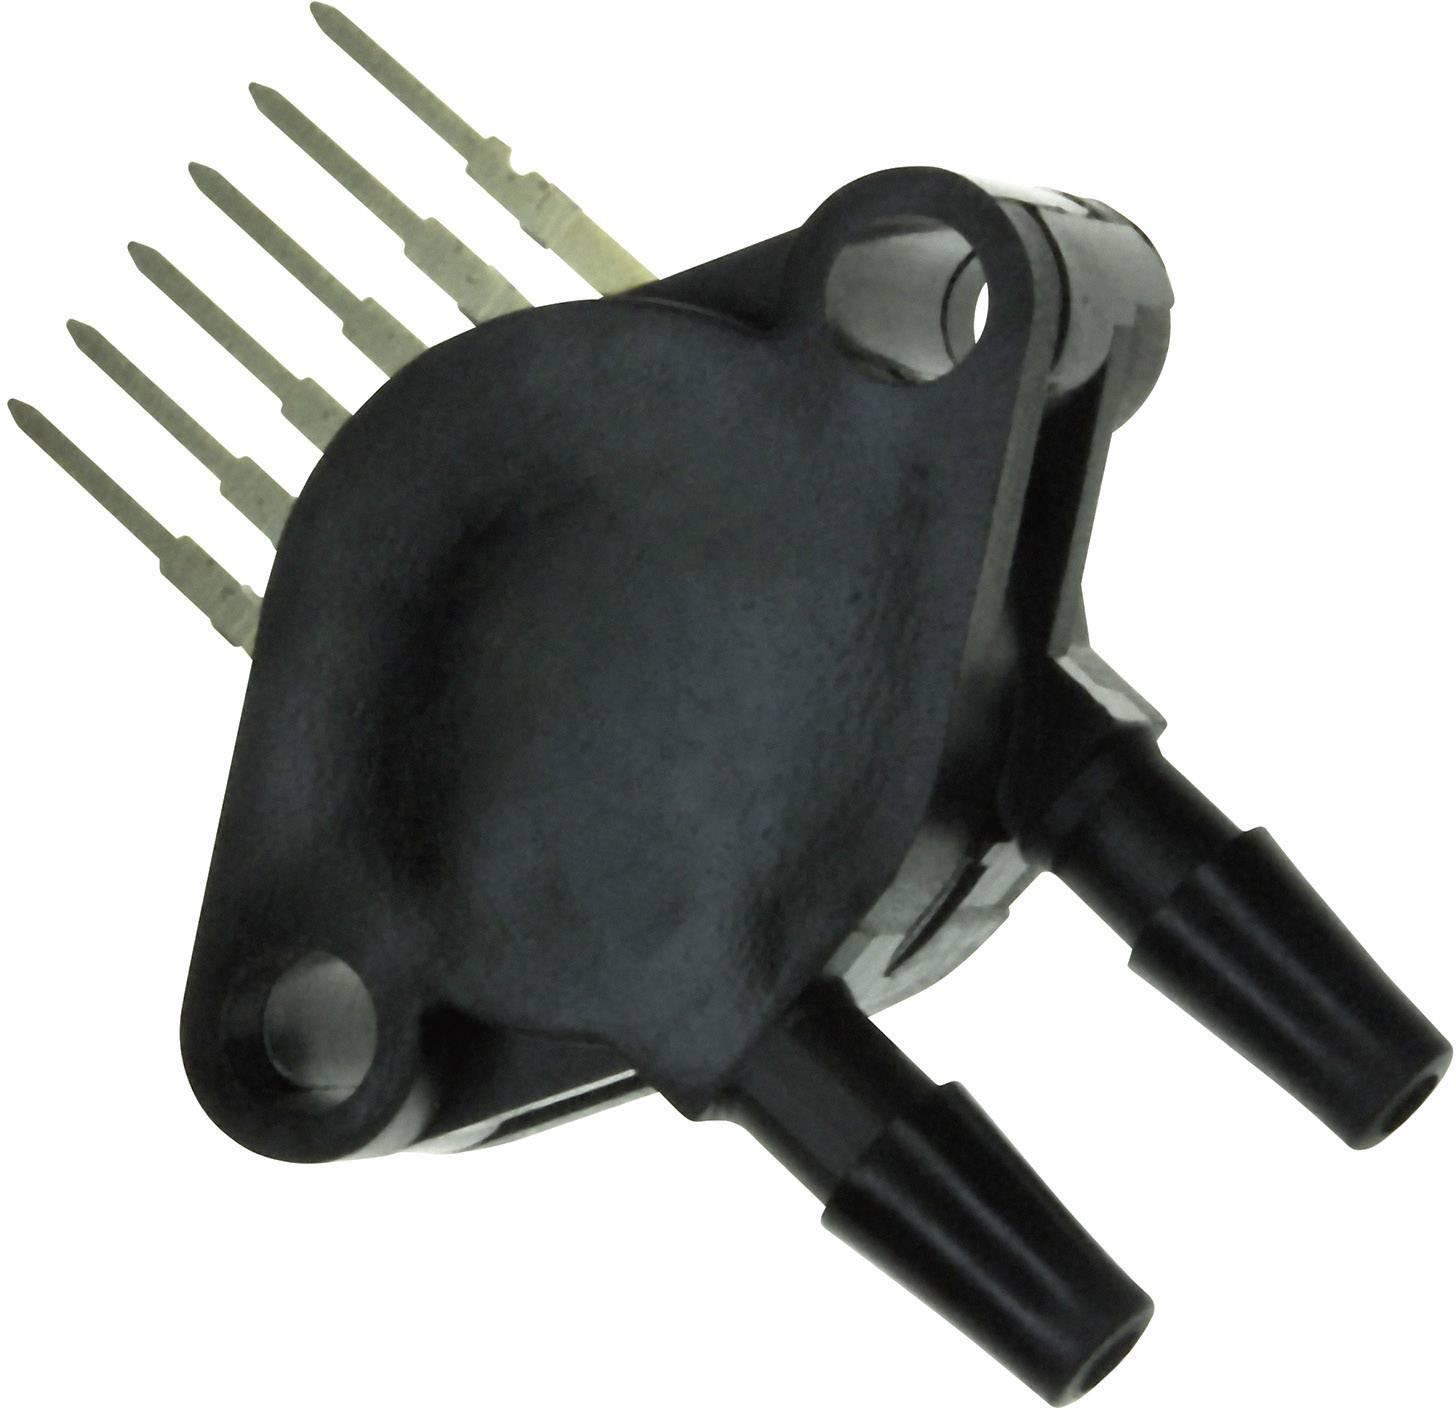 Senzor tlaku NXP Semiconductors MPX4250DP, 0 kPa až 250 kPa, do DPS